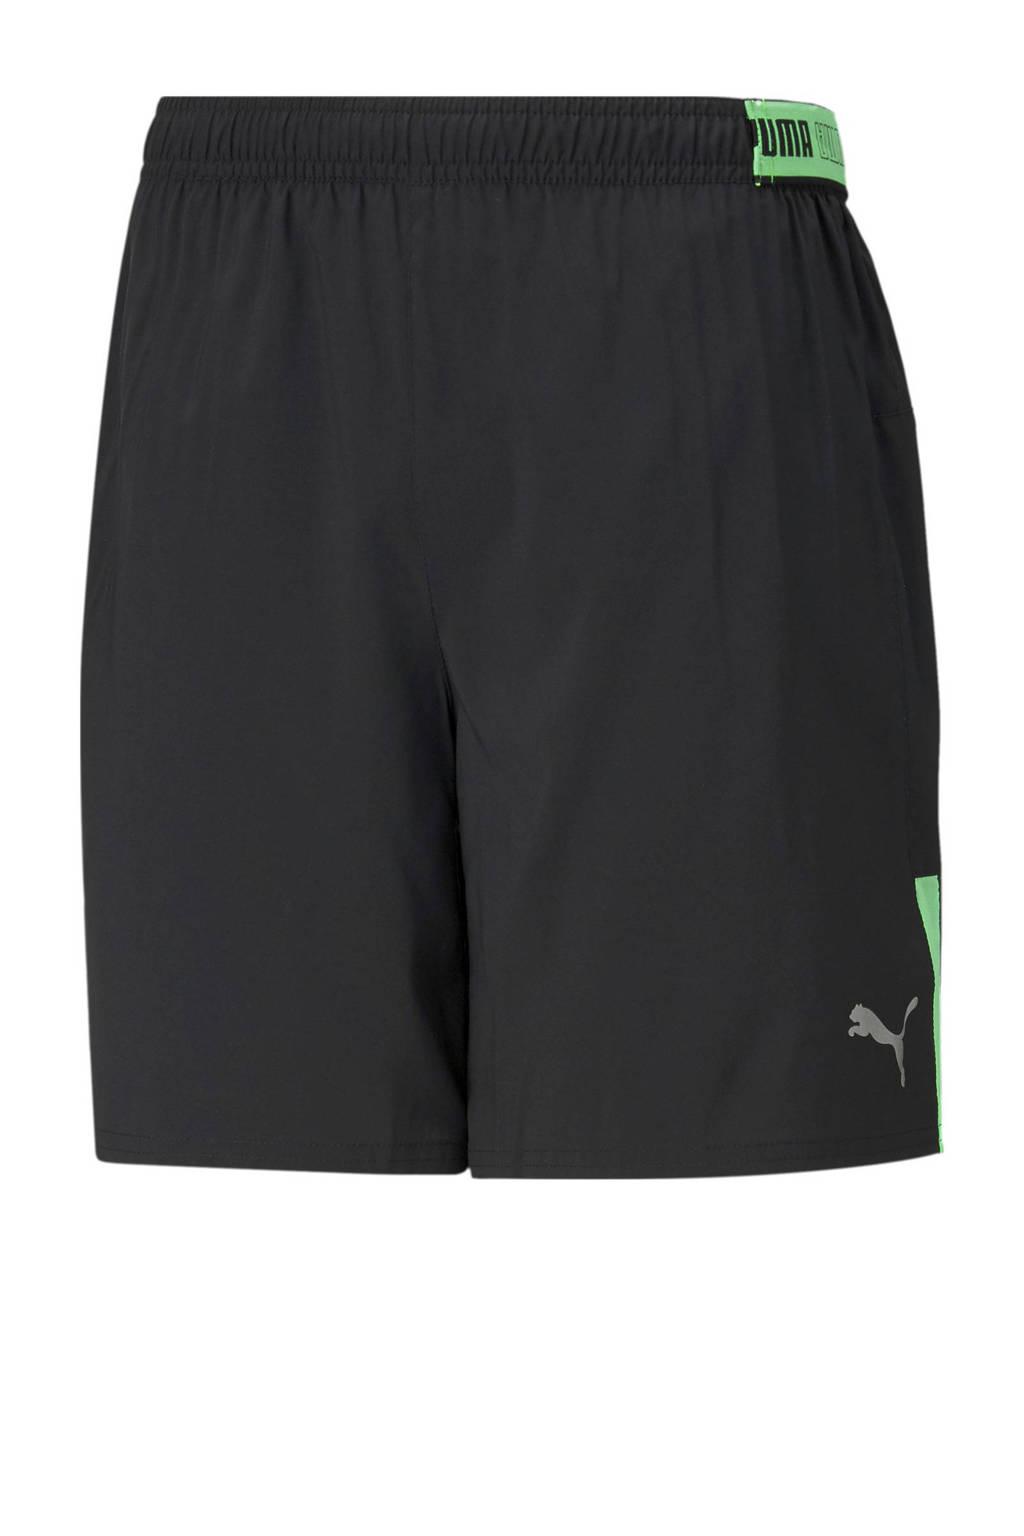 Puma   hardloopshort zwart/groen, Zwart/groen